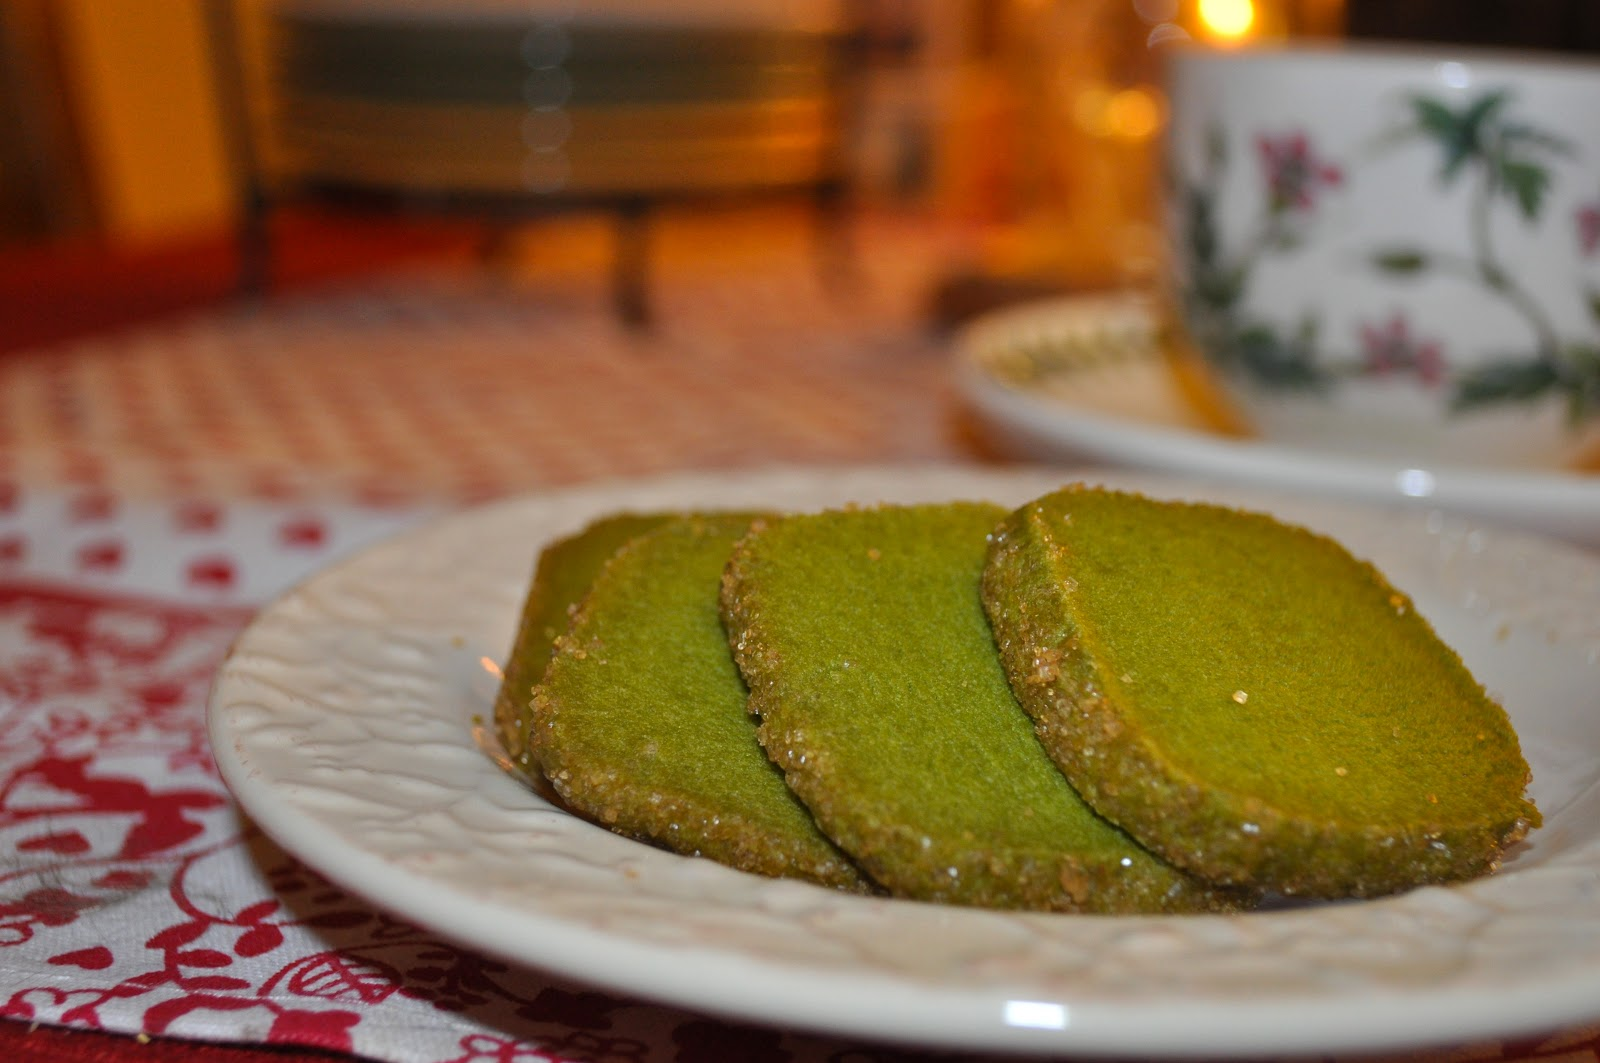 A Handmade Life: Matcha Green Tea Shortbread Cookies